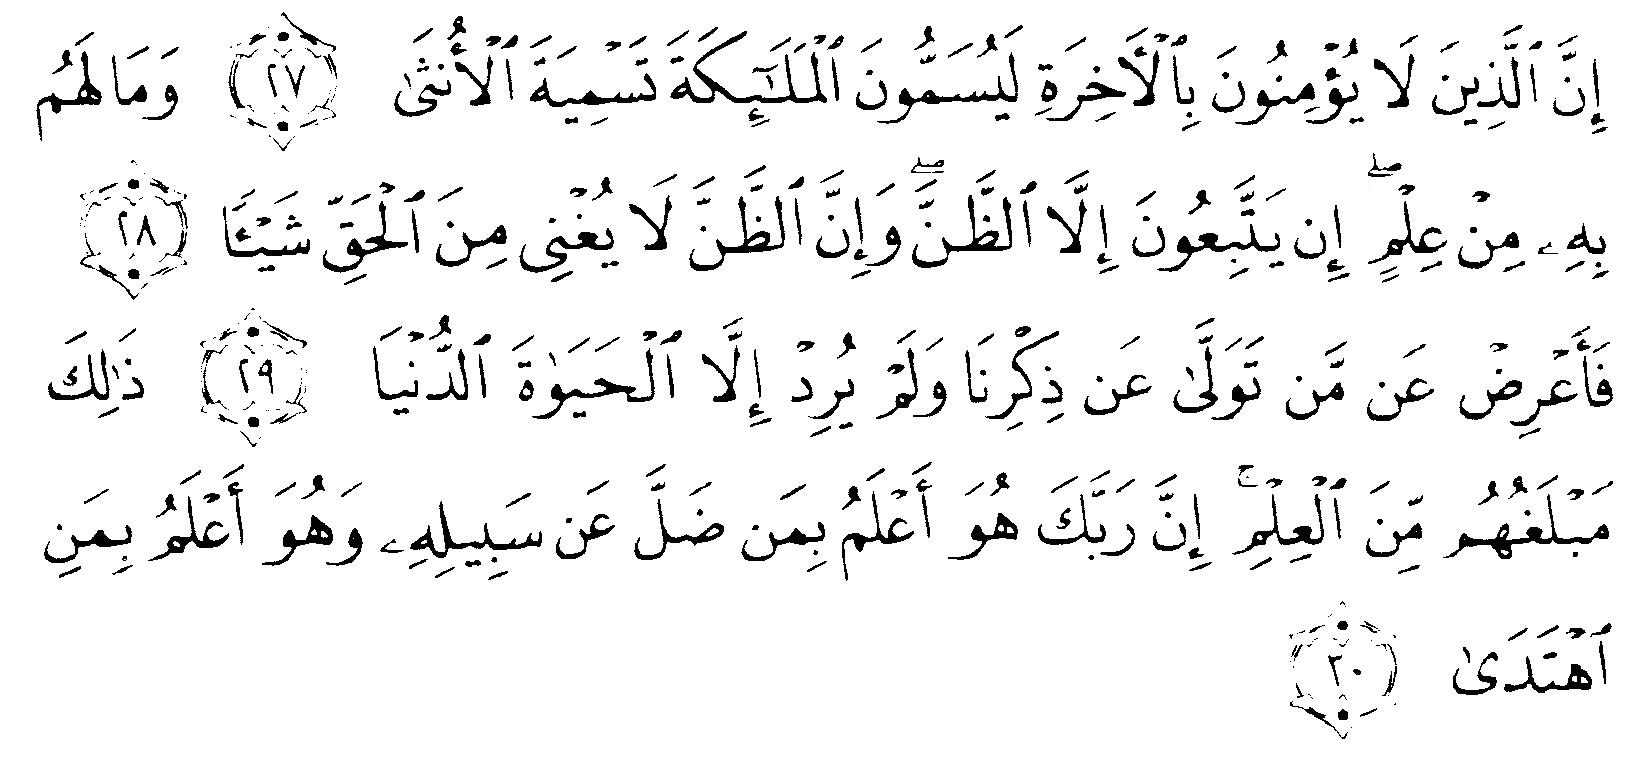 Tafsir Al Quran Surah An Najm 7 Alquranmulia